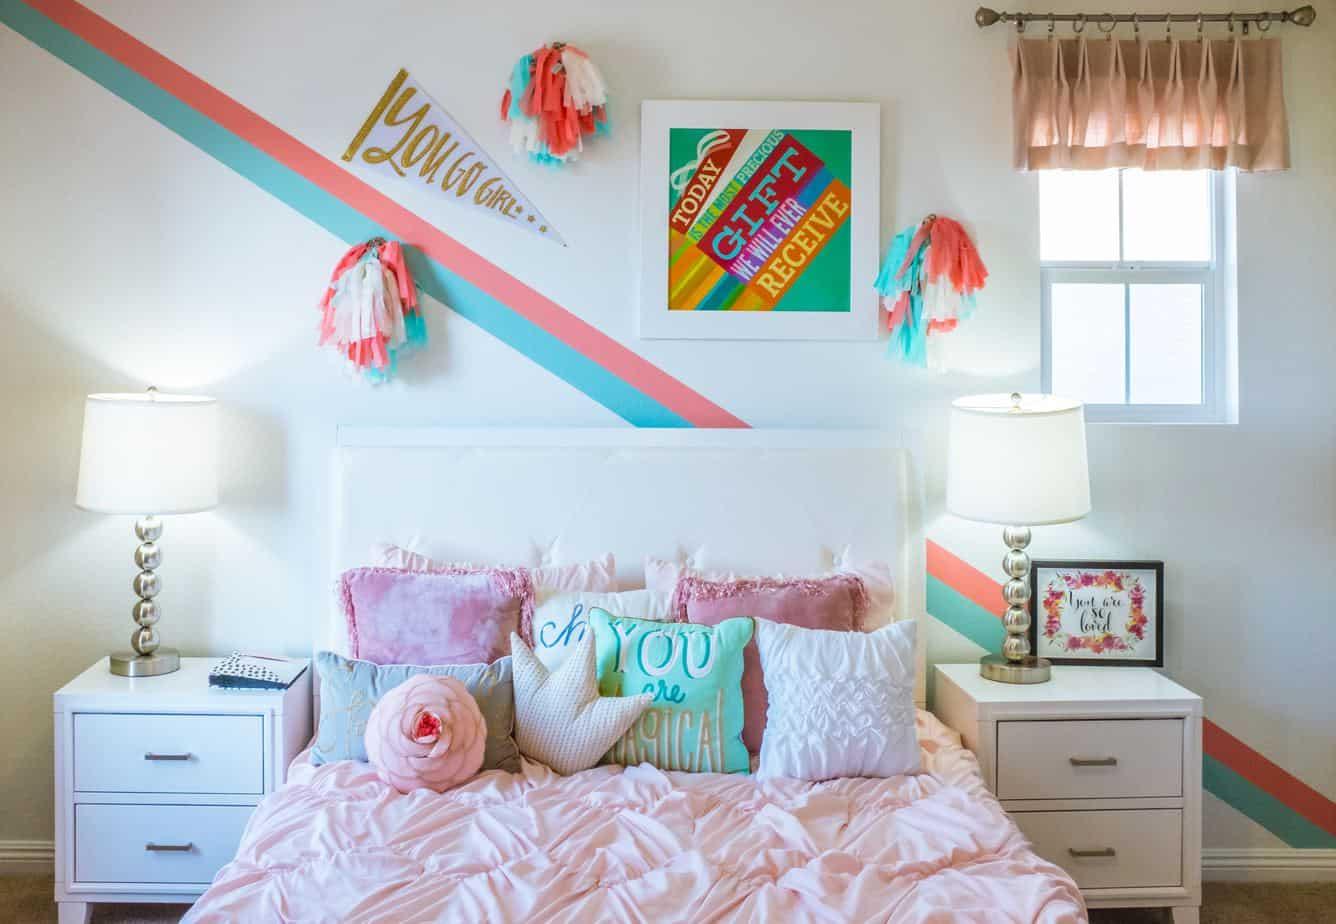 Bedroom renovations – Don't ignore the fun stuff